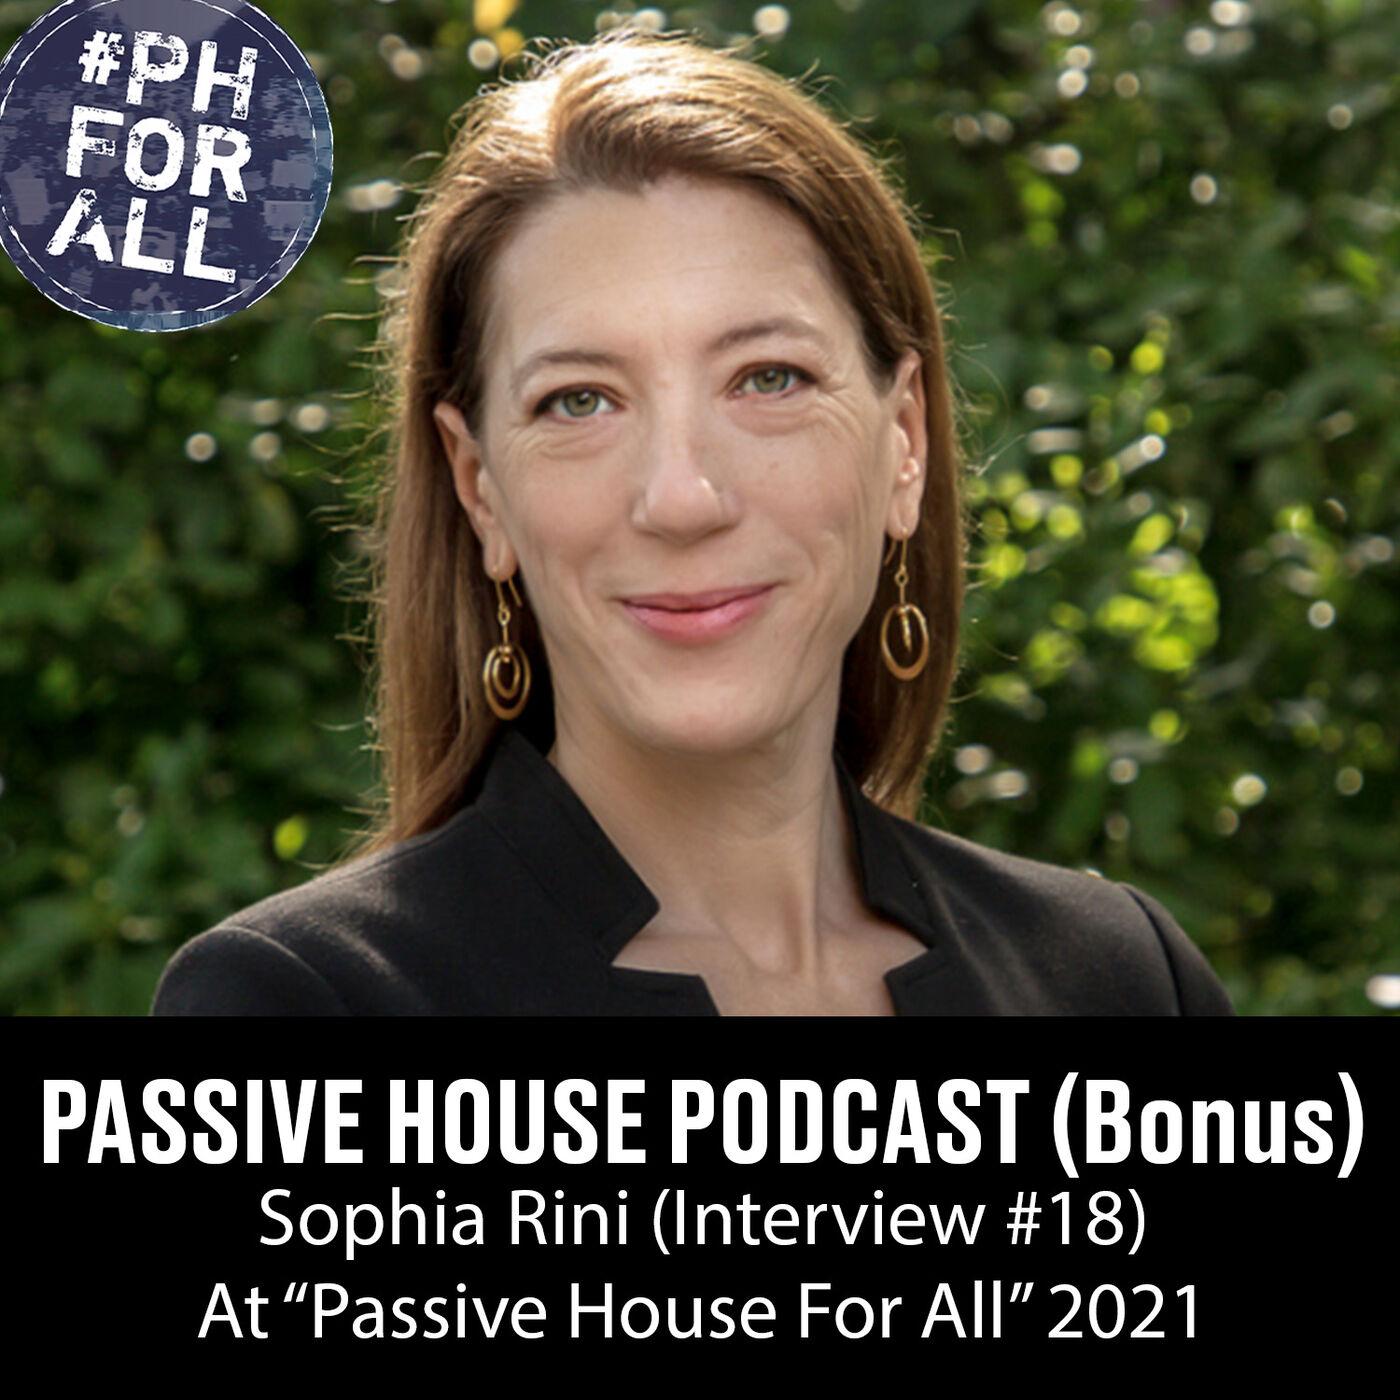 Bonus: Sophia Rini at Passive House For All Conference (Interview #18)